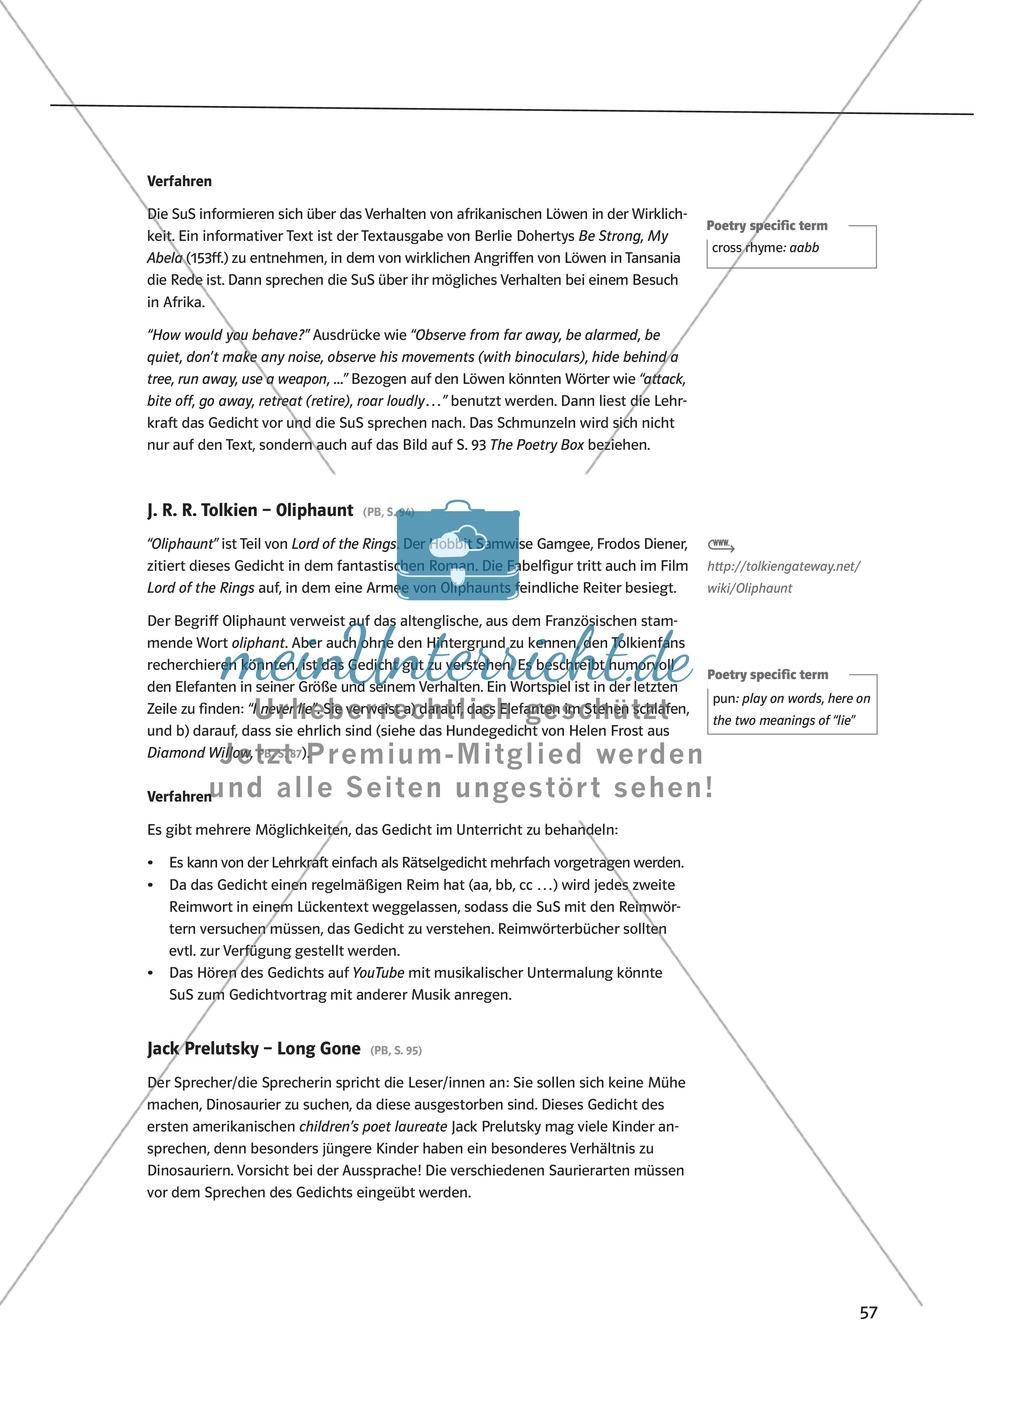 The Poetry Box: Wild Things? Beispiele + Lernziele + Verfahren + Arbeitsblätter Preview 7